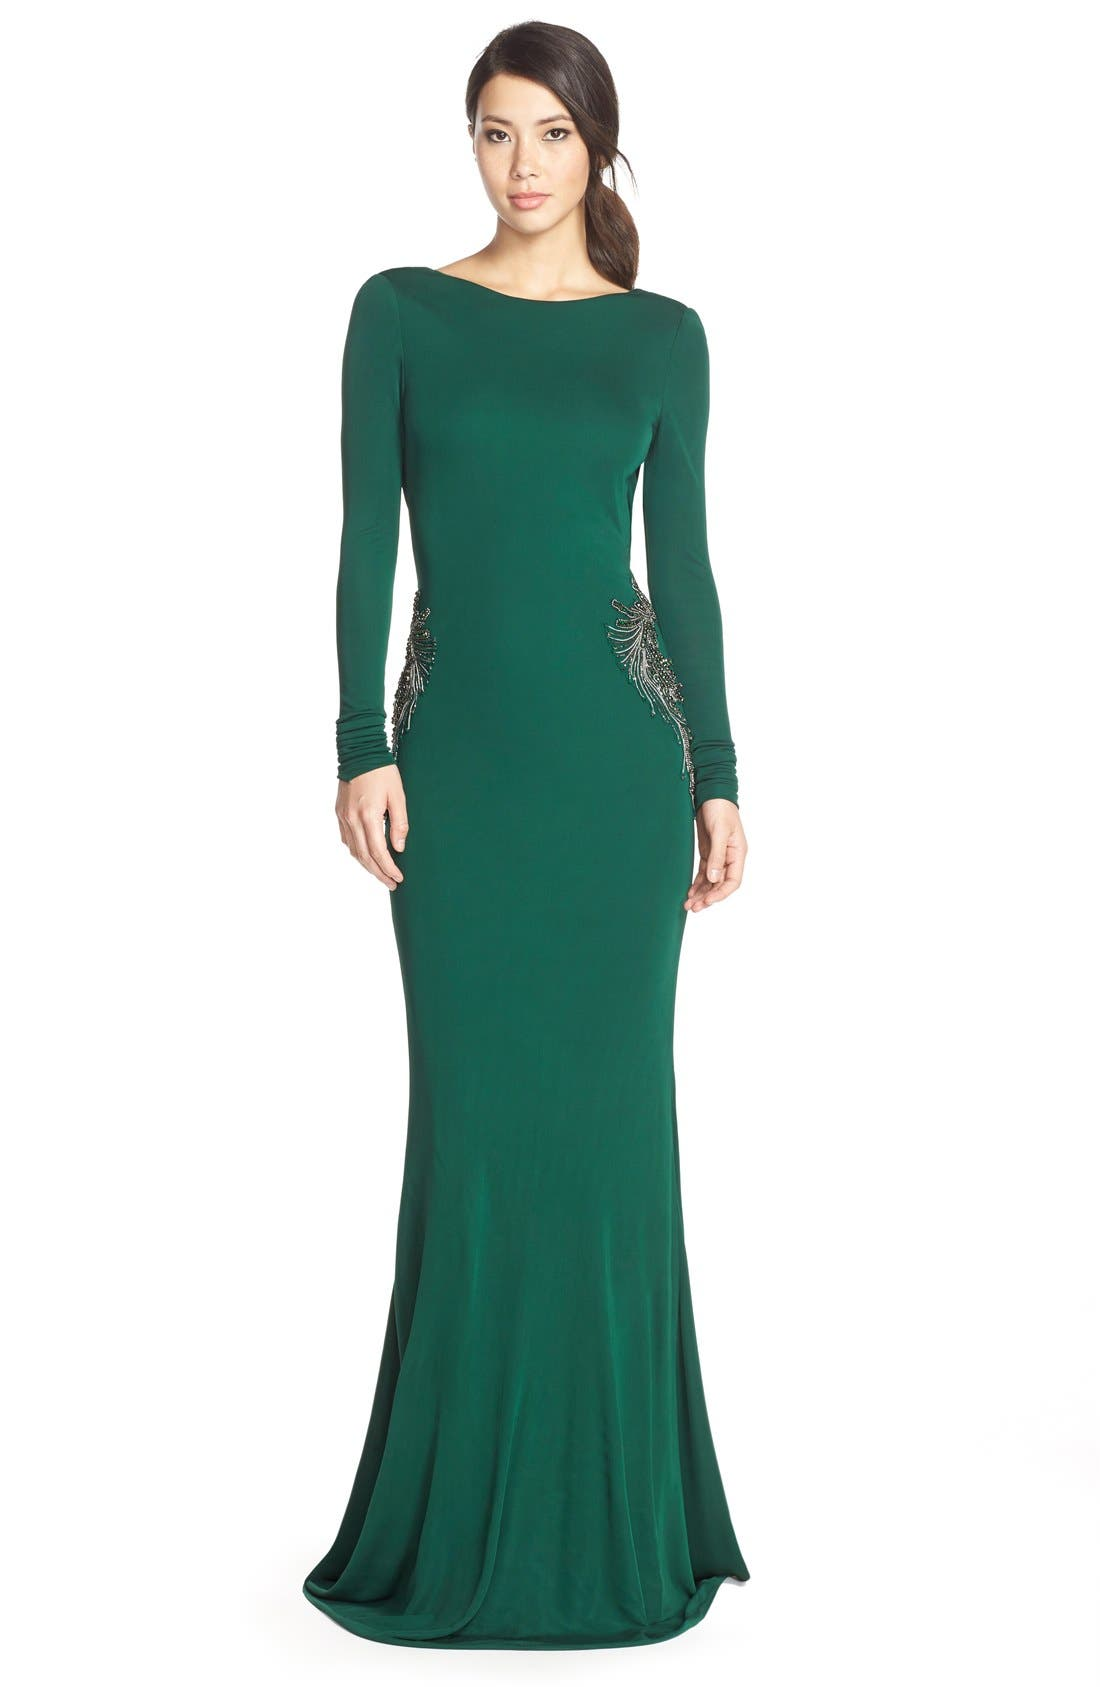 Alternate Image 1 Selected - Badgley Mischka Beaded Jersey Mermaid Gown